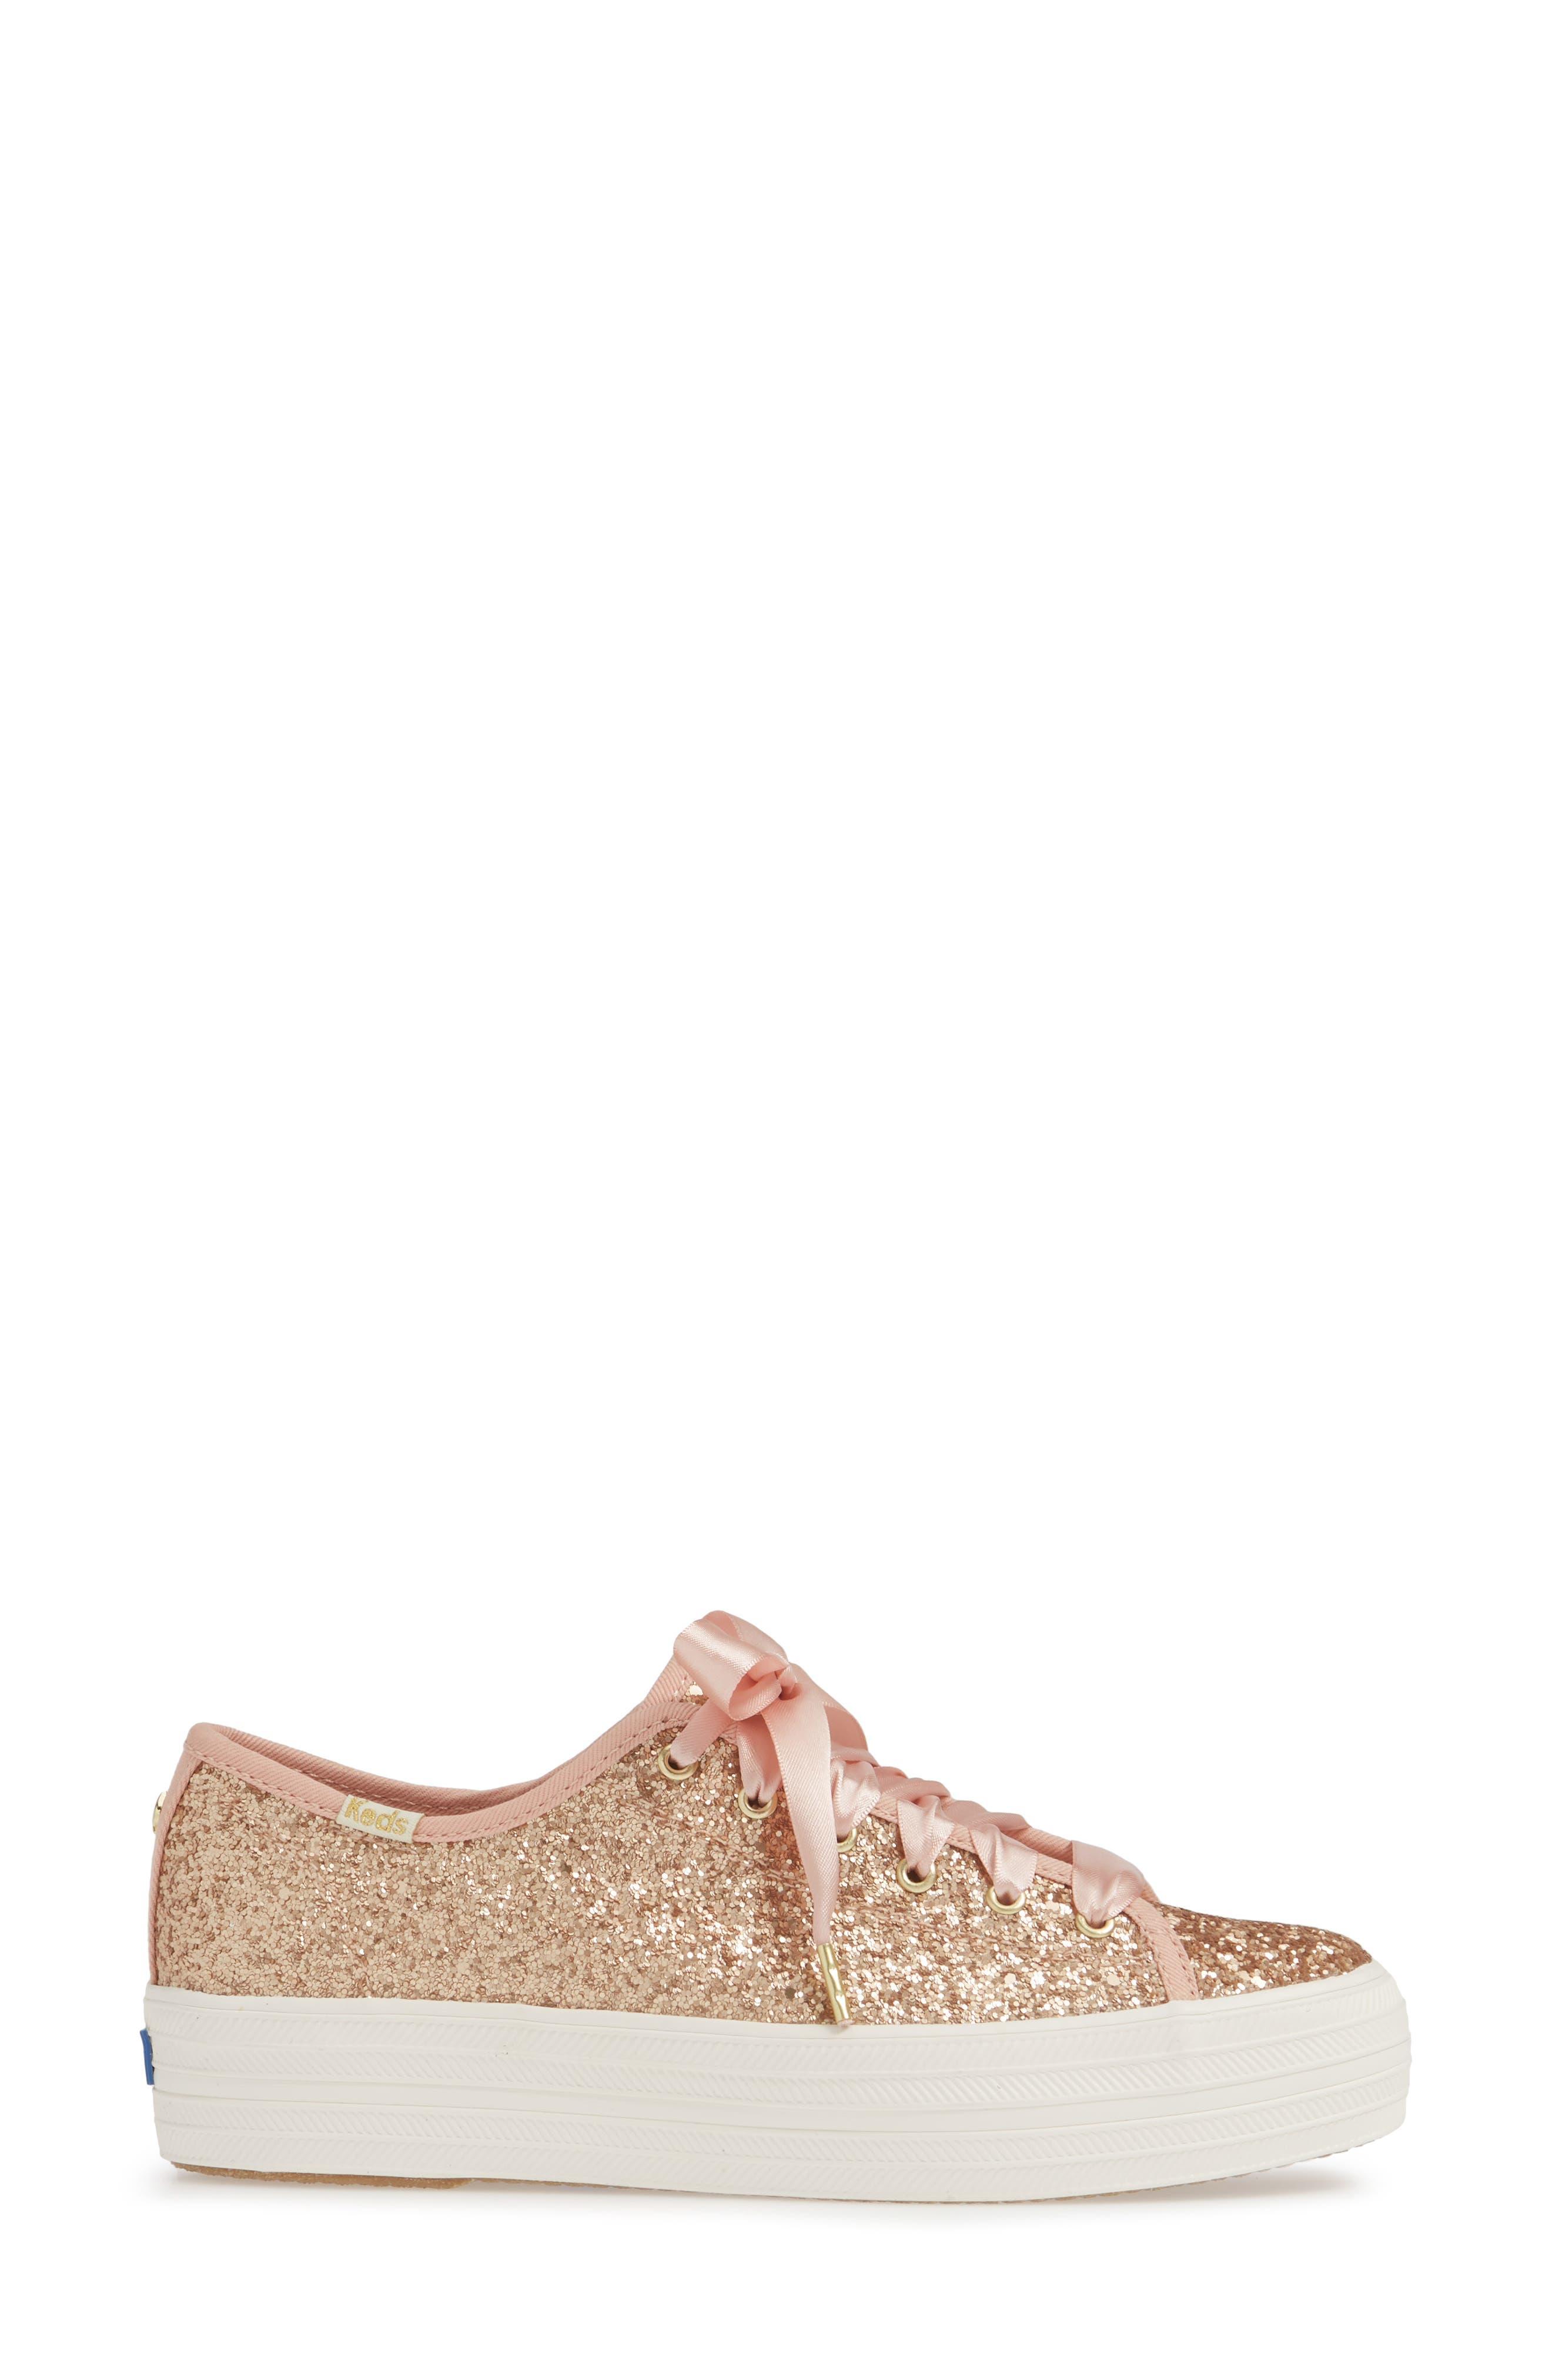 KEDS<SUP>®</SUP> FOR KATE SPADE NEW YORK, Keds<sup>®</sup> x kate spade new york Triple Kick Glitter Sneaker, Alternate thumbnail 3, color, ROSE GOLD